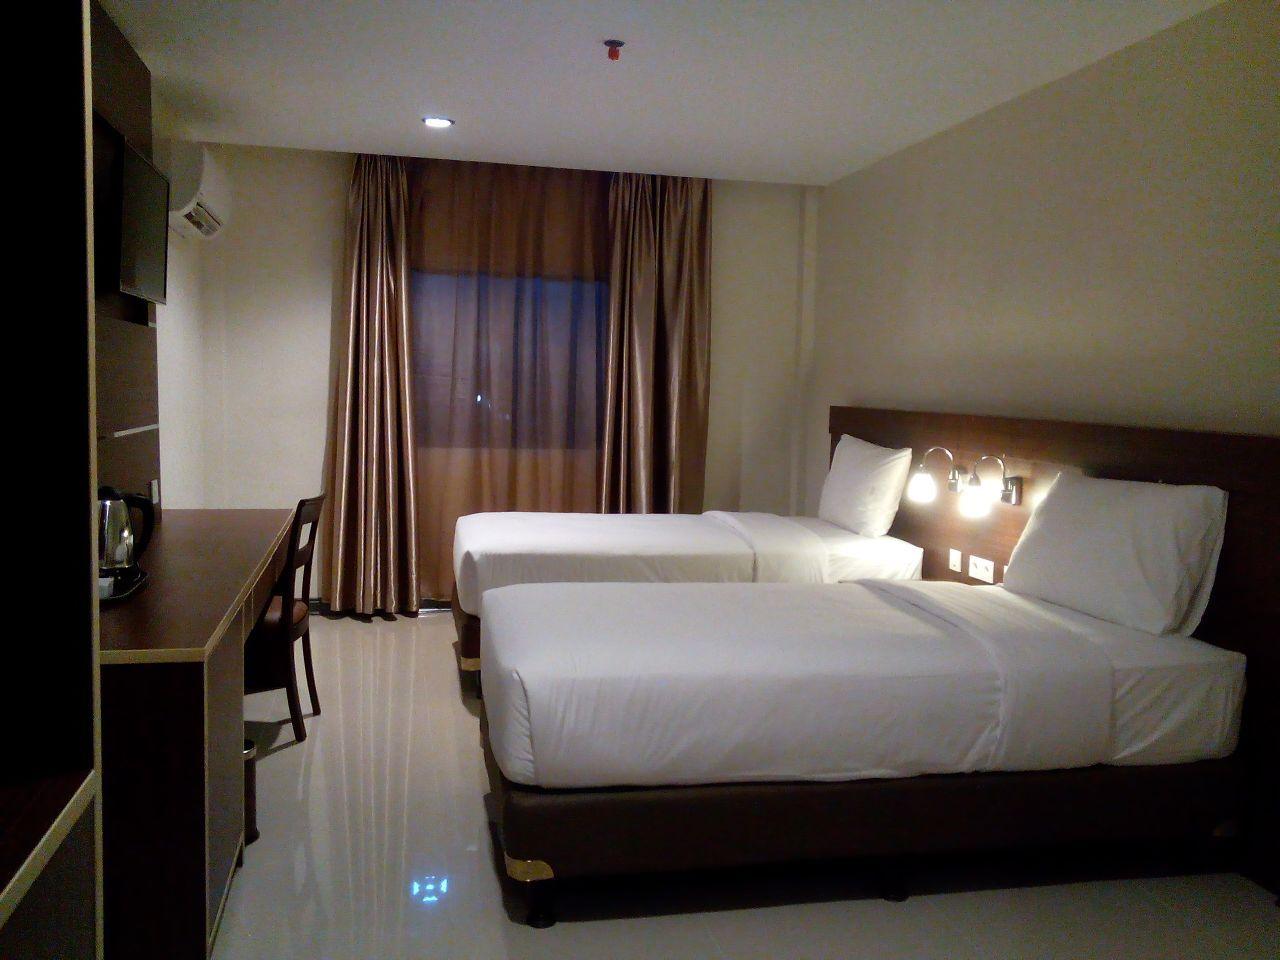 Megara Hotel Pekanbaru